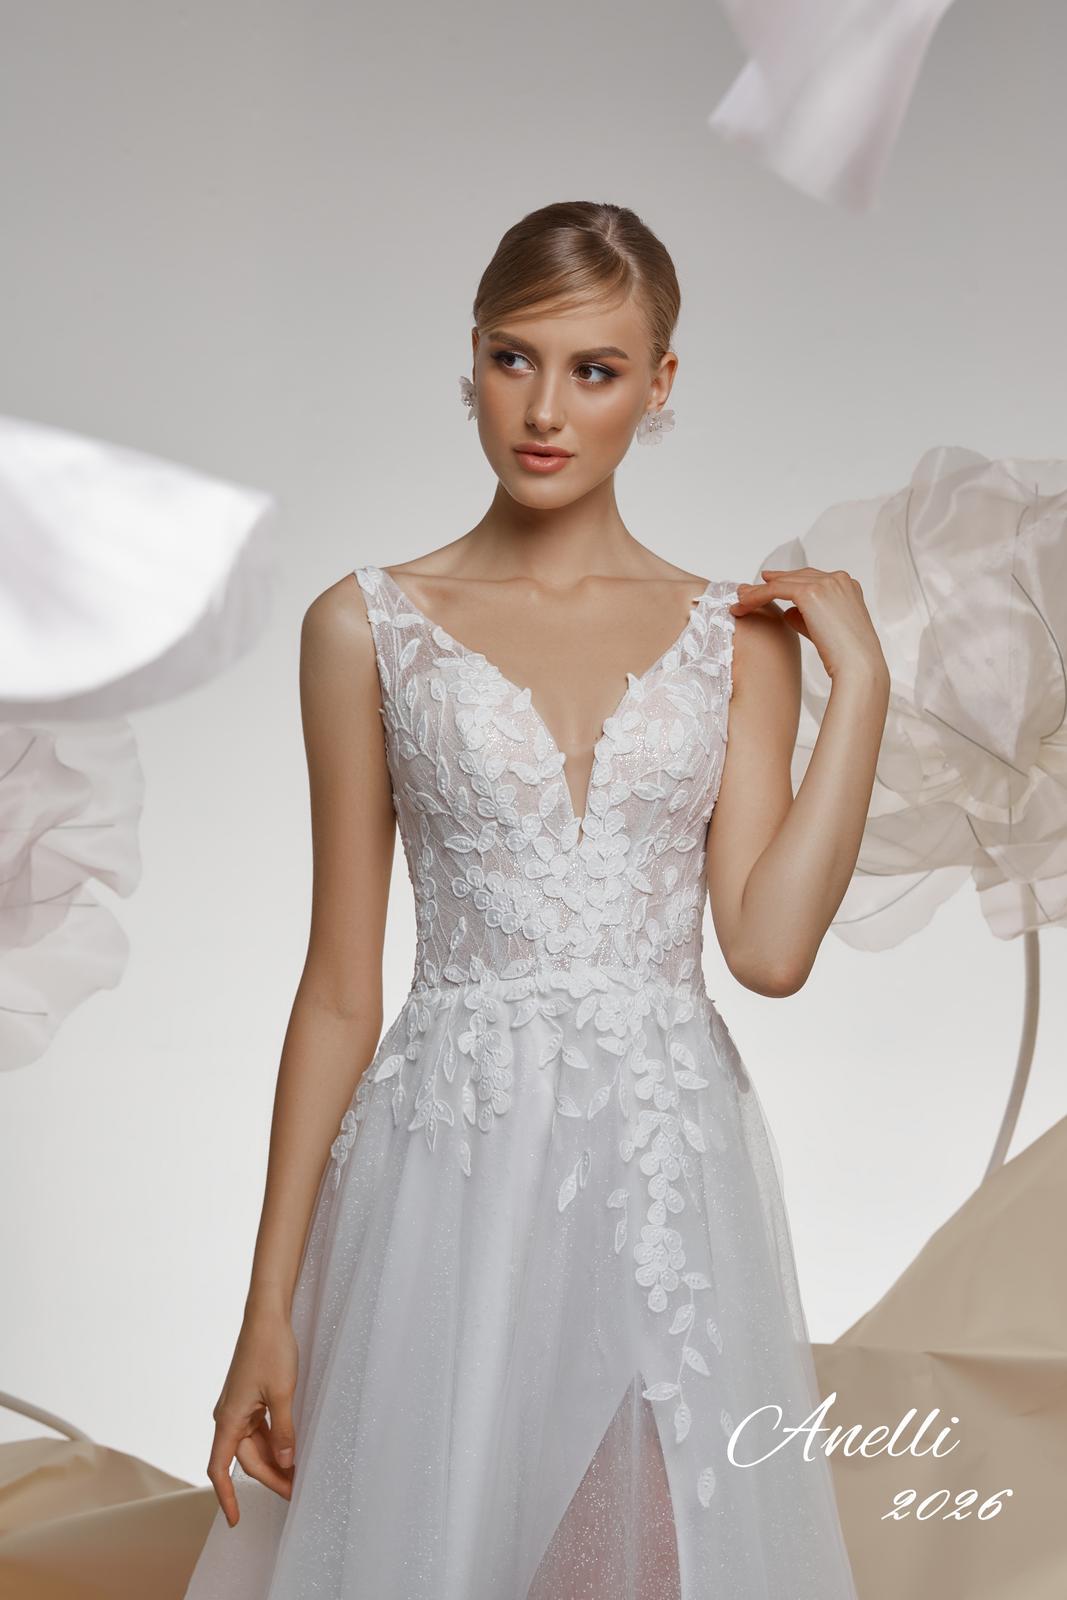 Svadobné šaty - Imagine 2026 - Obrázok č. 2